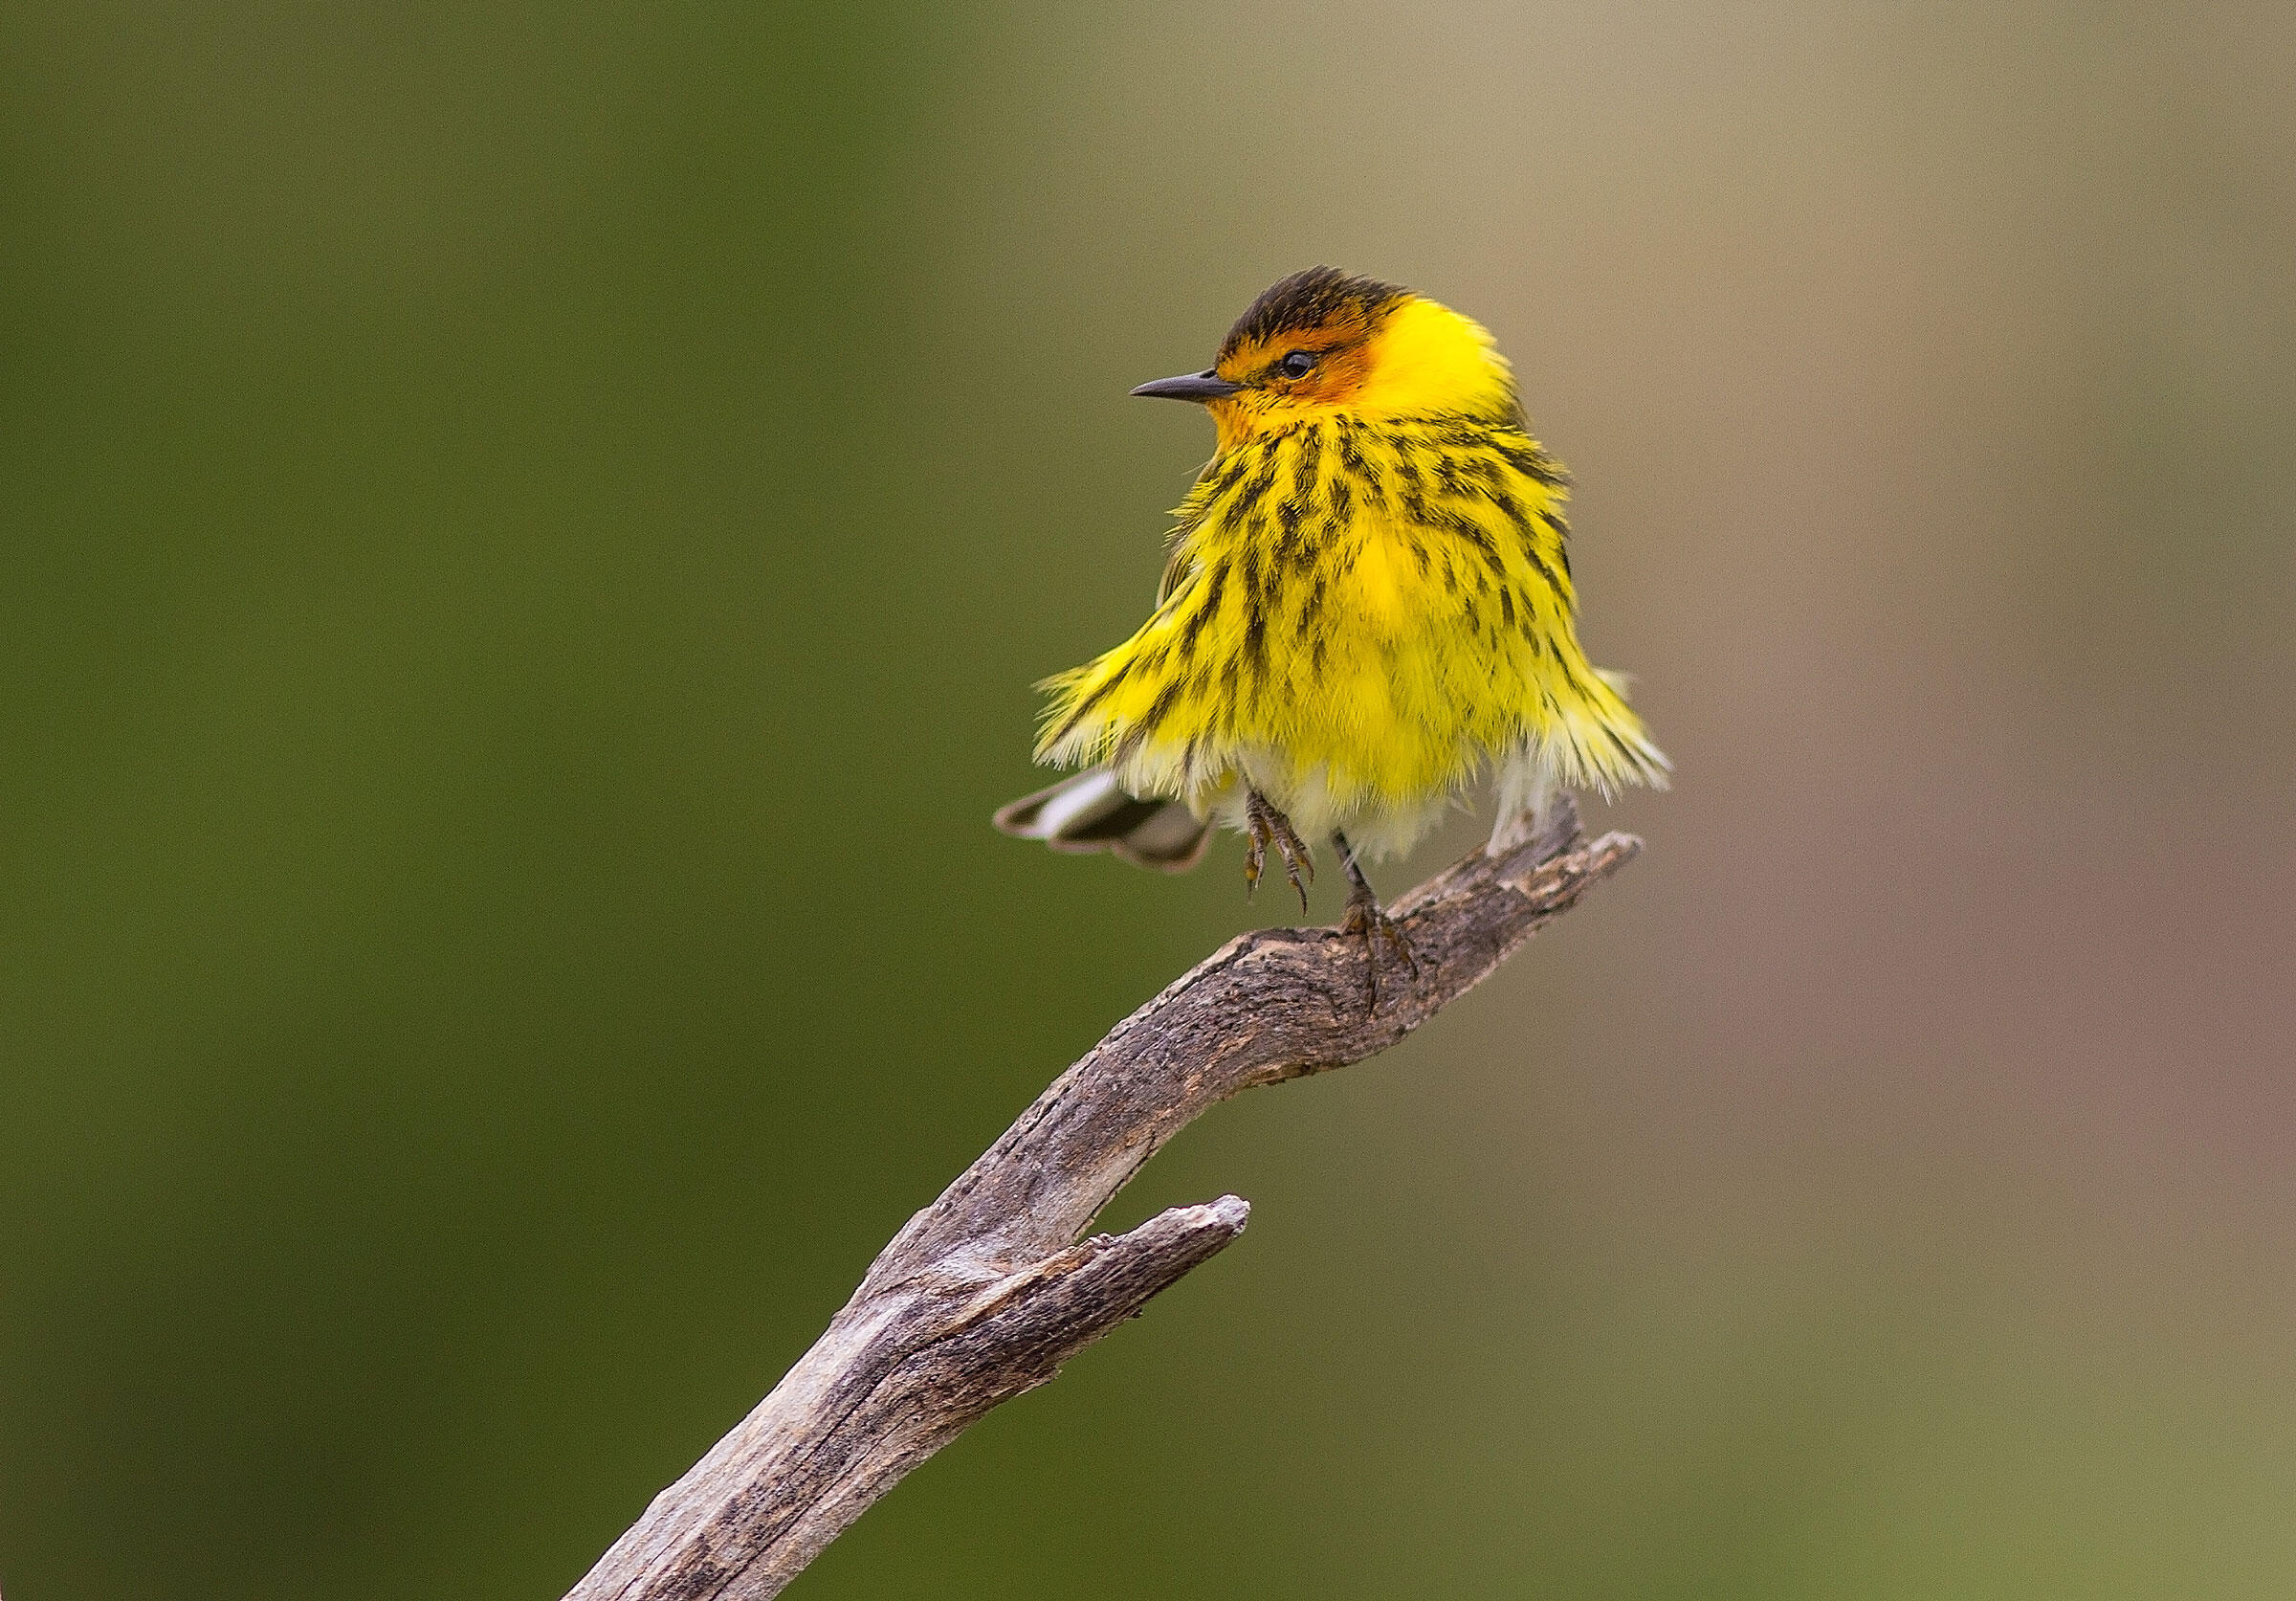 Cape May Warbler/Amateur Category. L.E. Swanson/Audubon Photography Awards